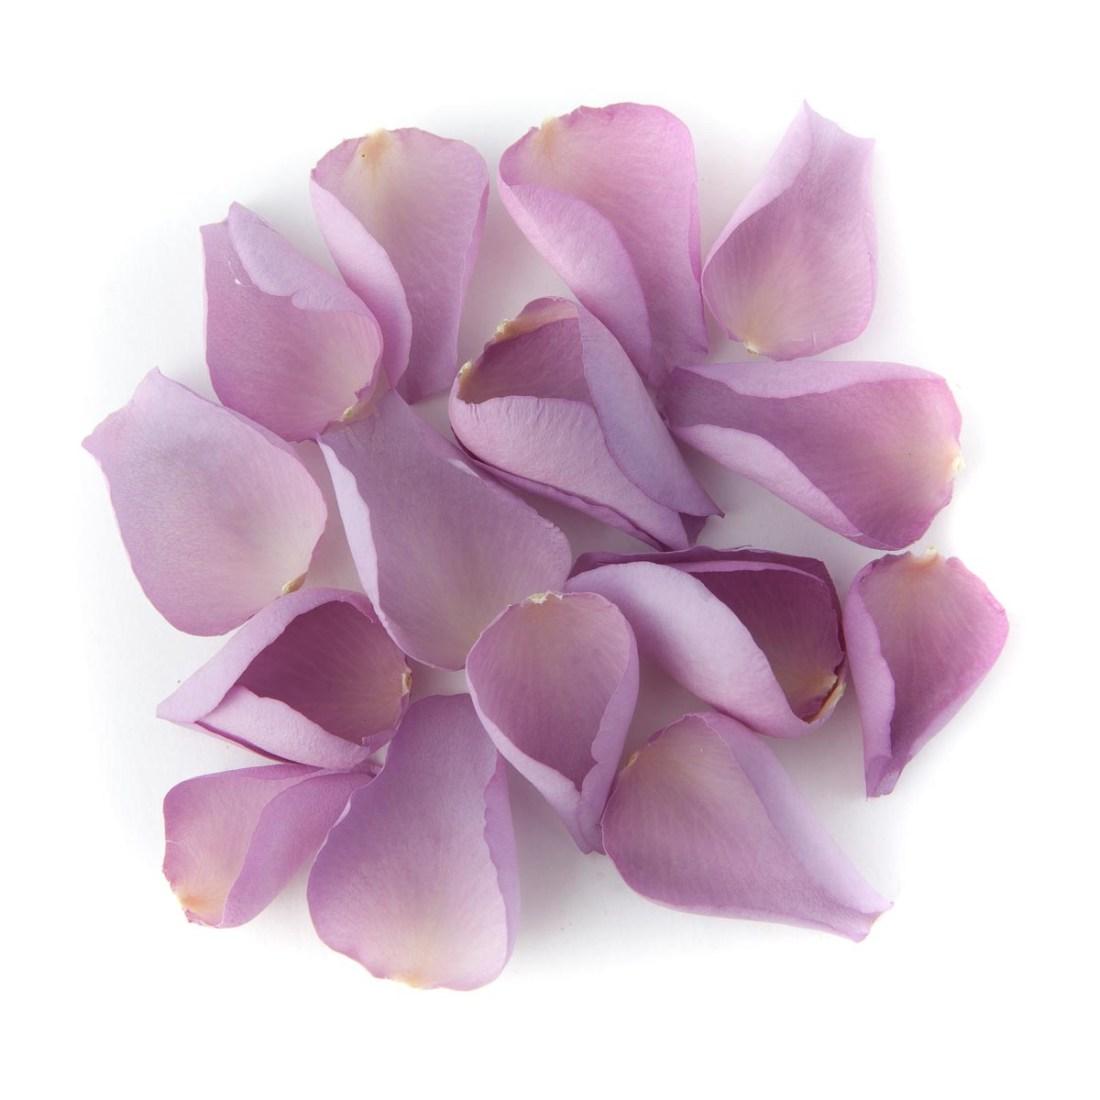 Flower petals - wedding aisles and petal pathways: Mauve Large Natural Rose Petals